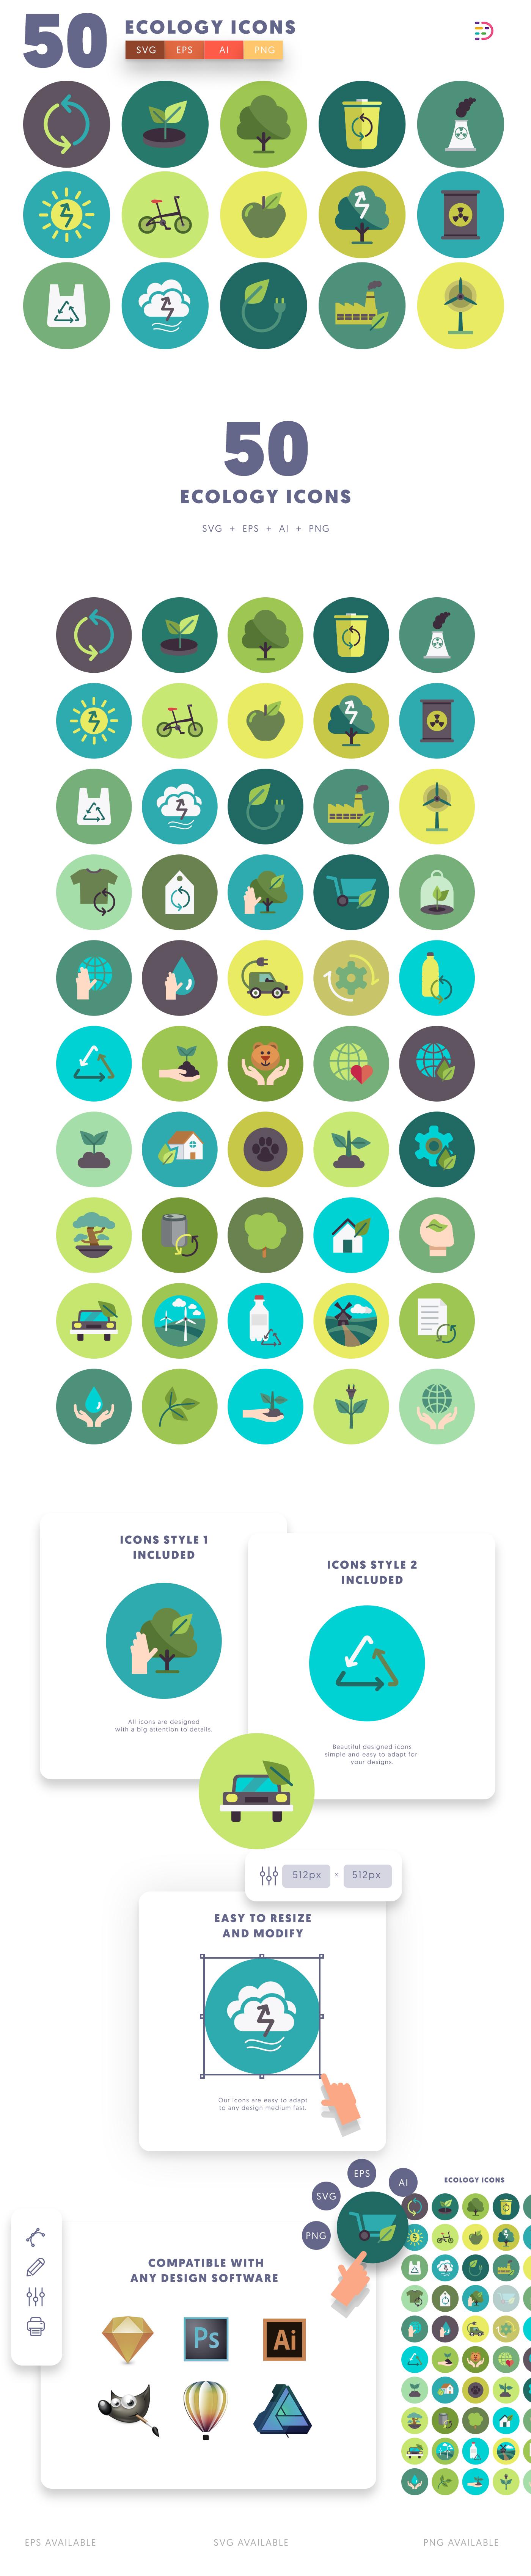 50 Ecology Icon list